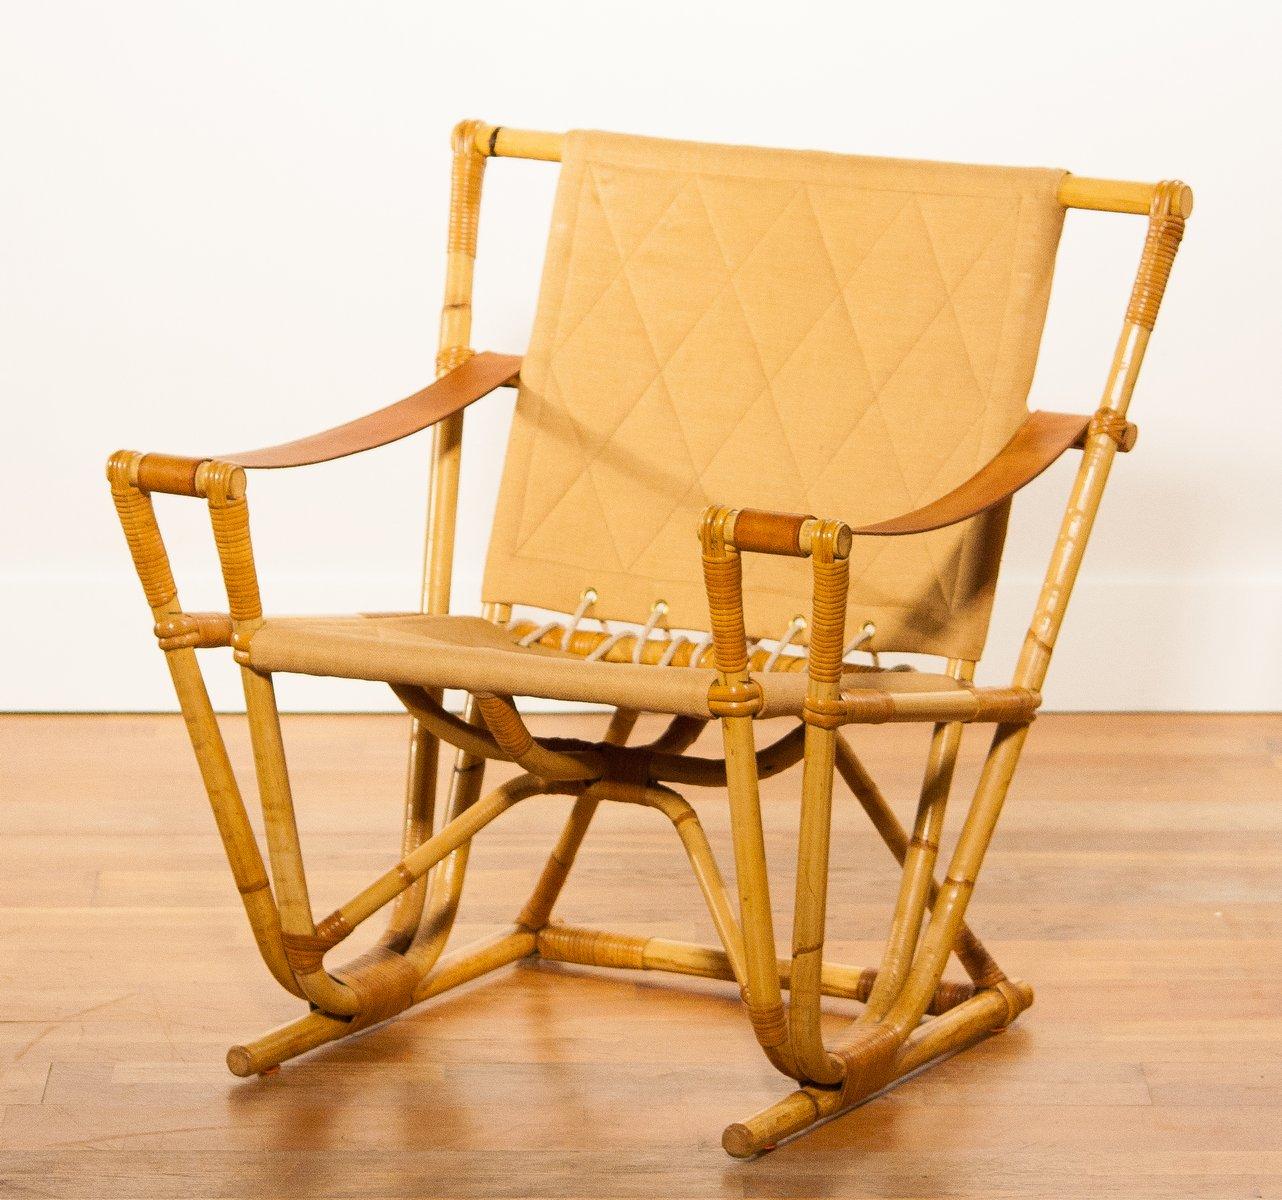 Bamboo rocking chair - Bamboo Chair 1950s